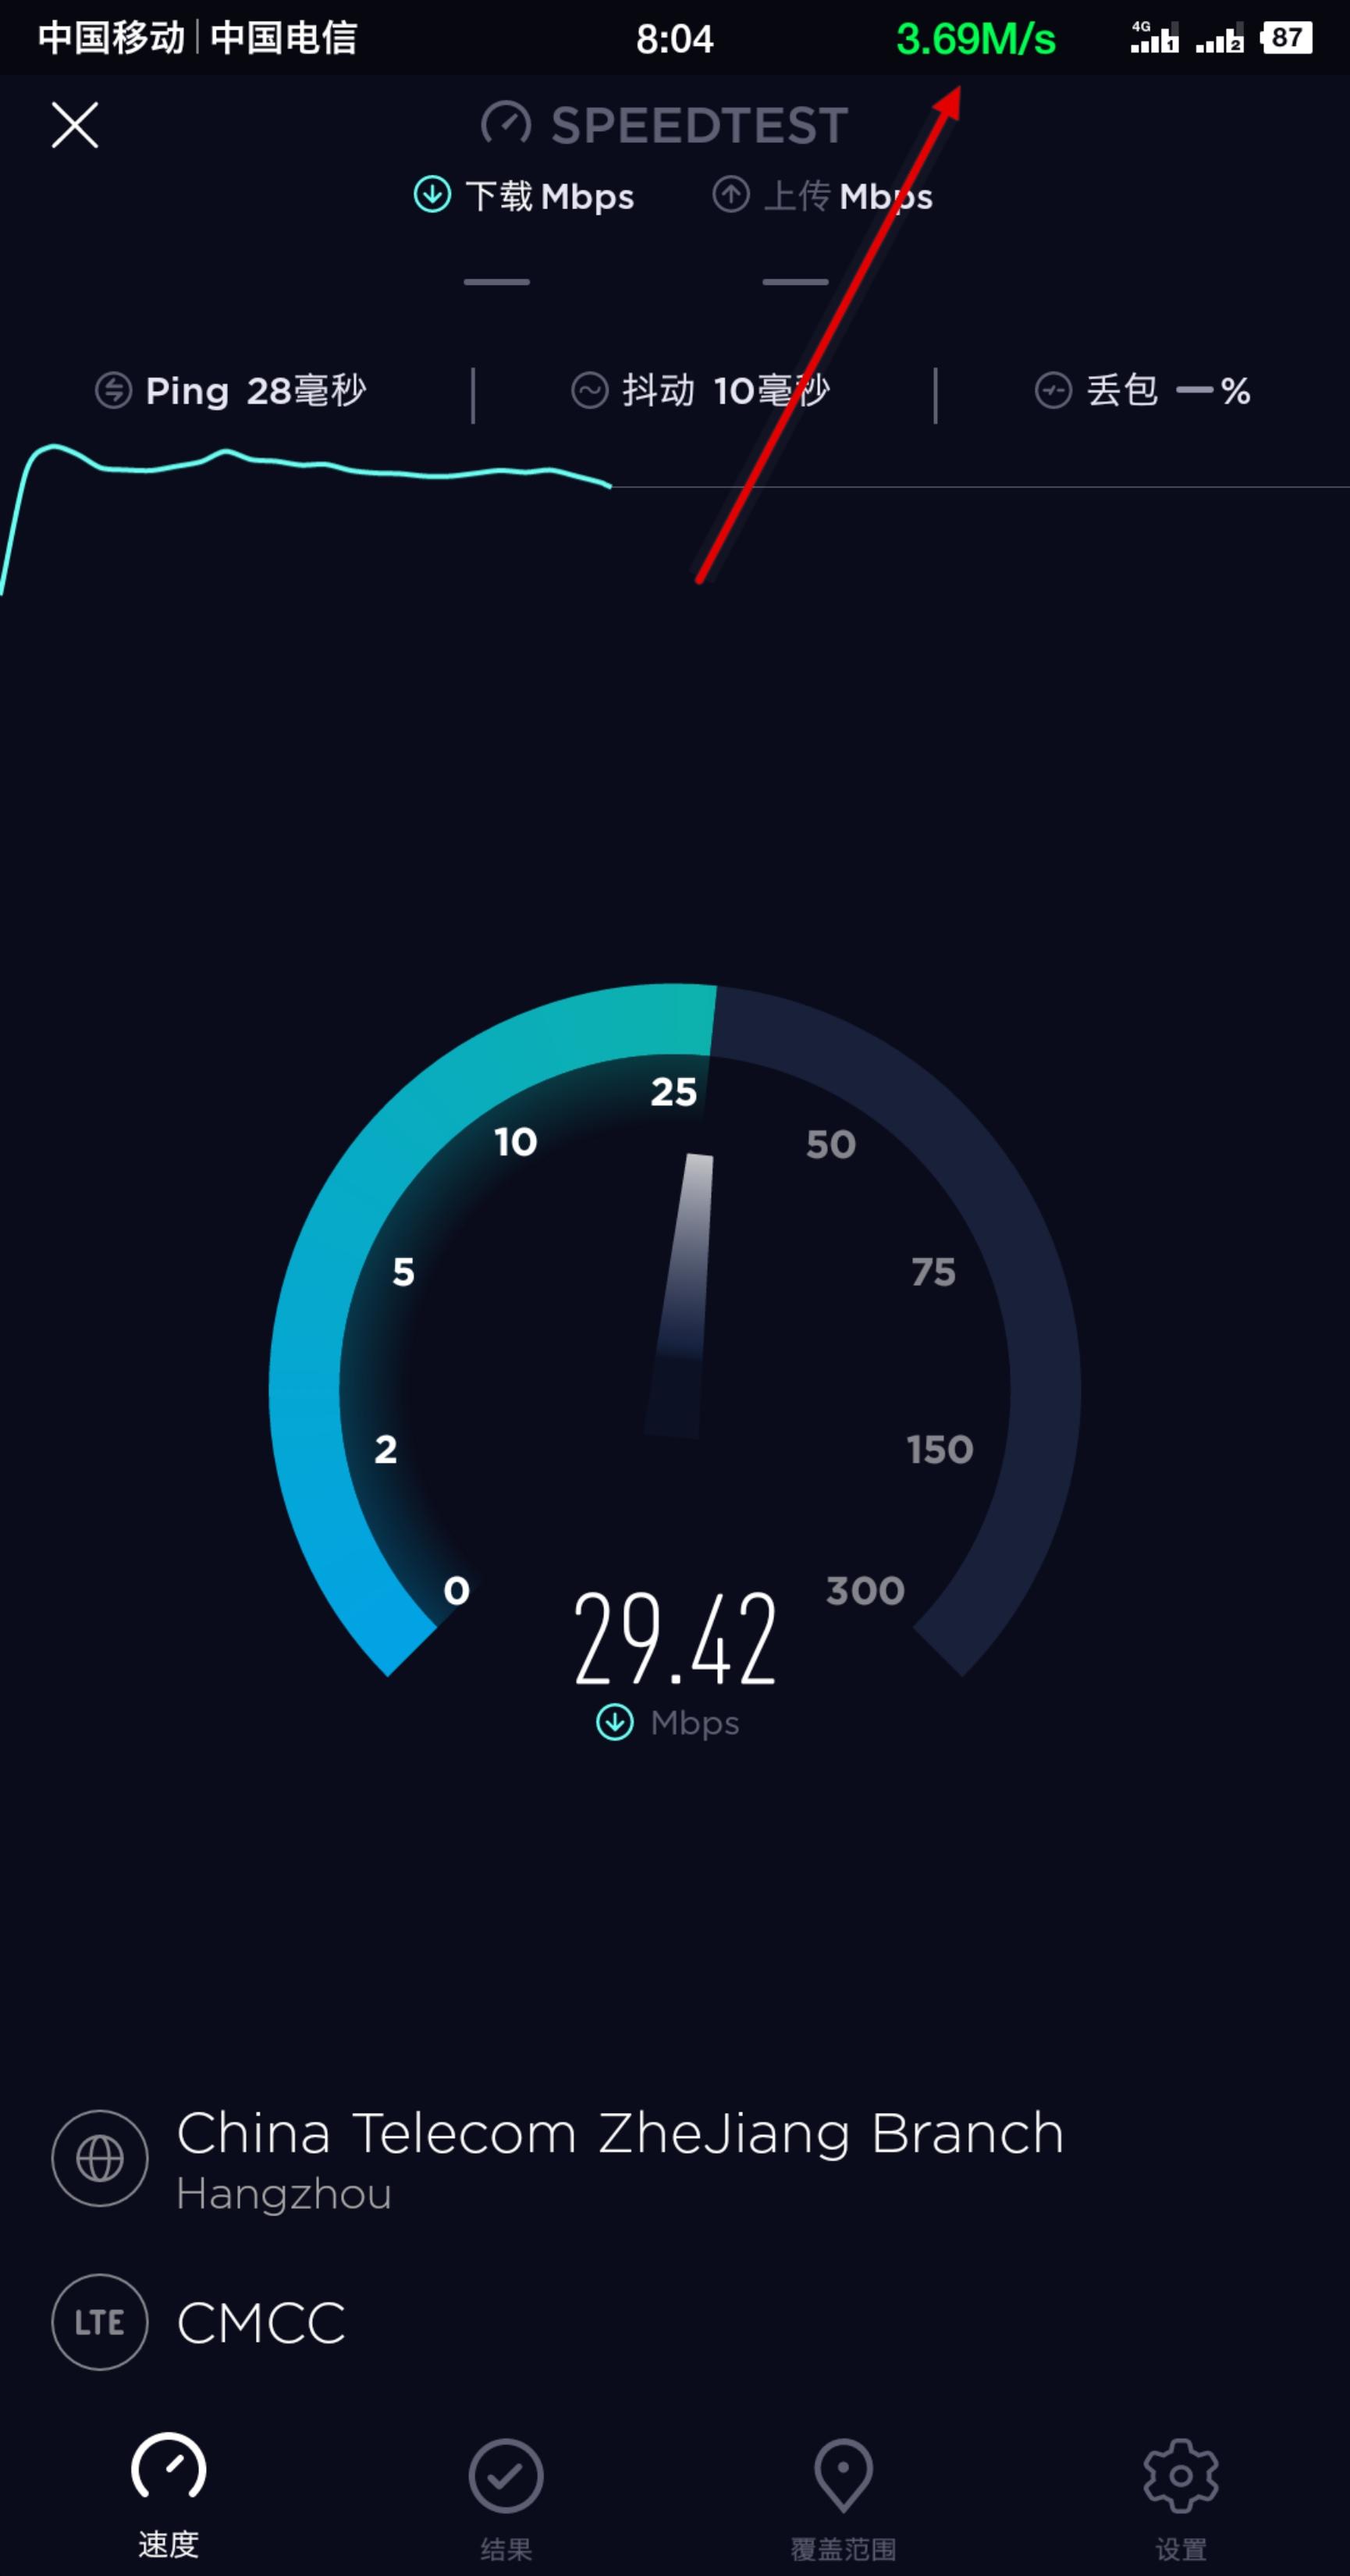 ??_Screenshot_2018-12-31-08-04-48-440_Speedtest.png